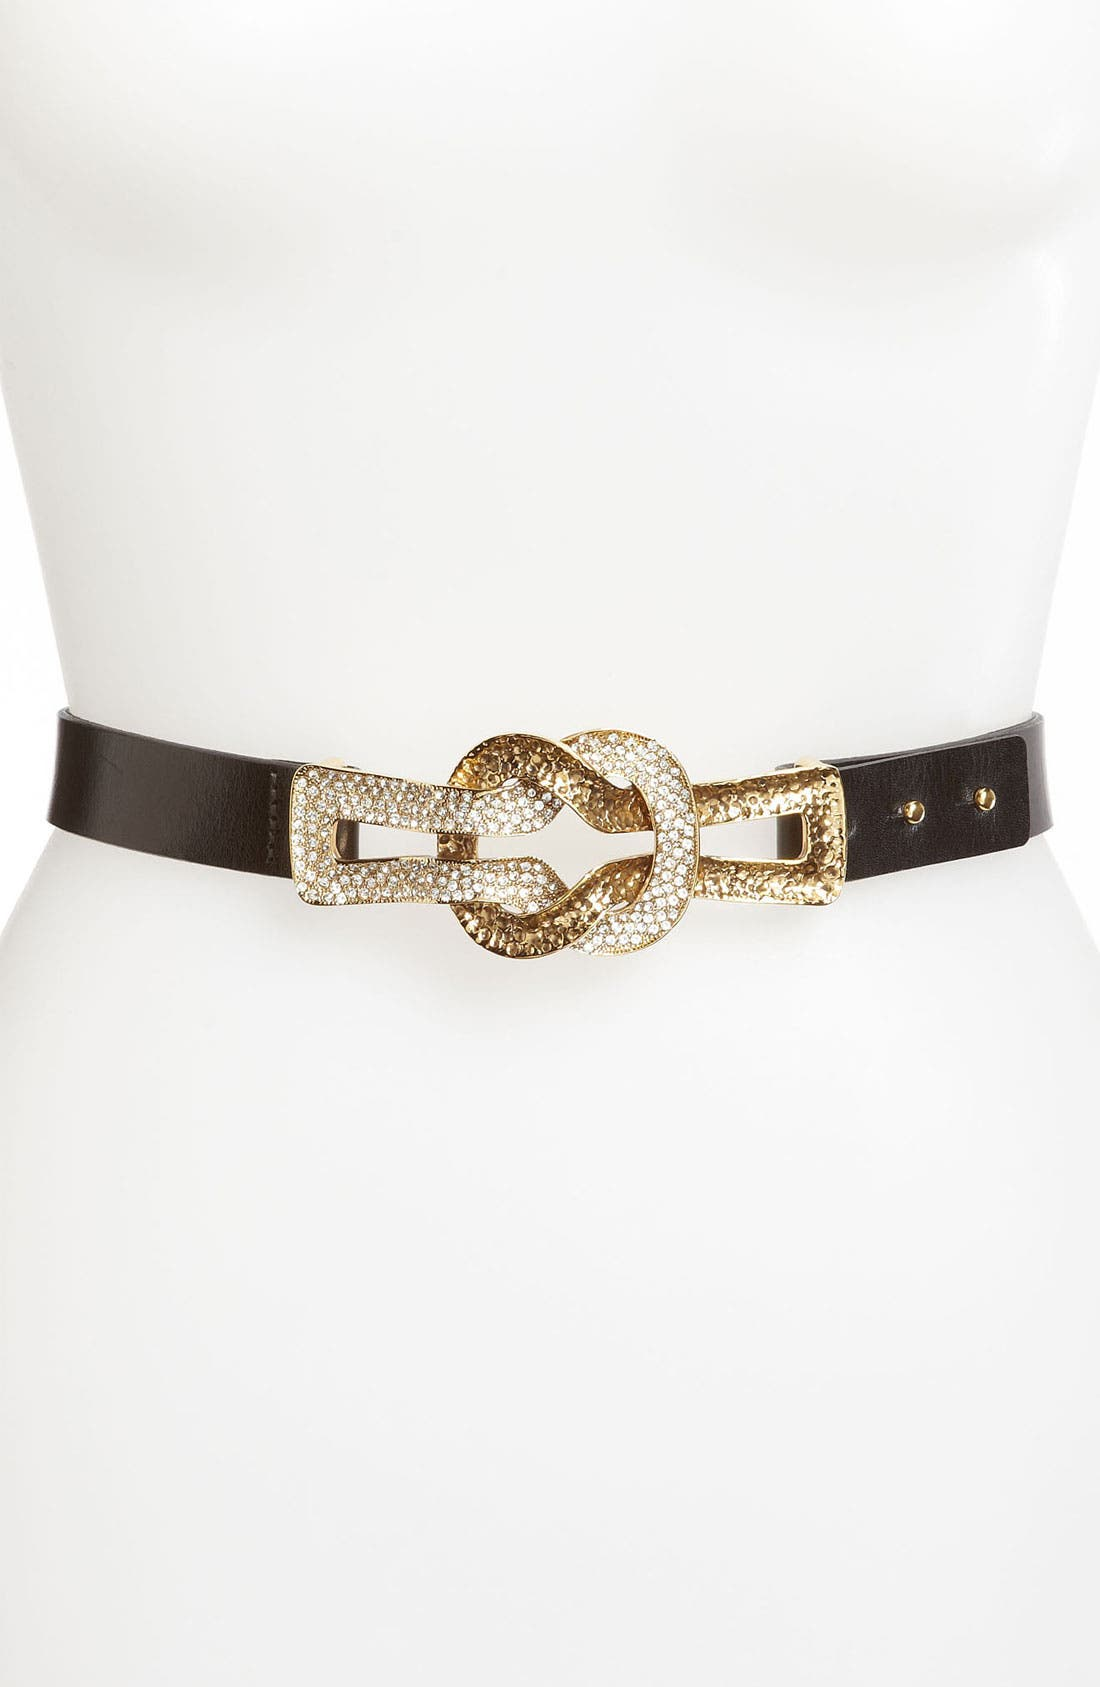 Alternate Image 1 Selected - St. John Collection Knot Hardware Leather Belt